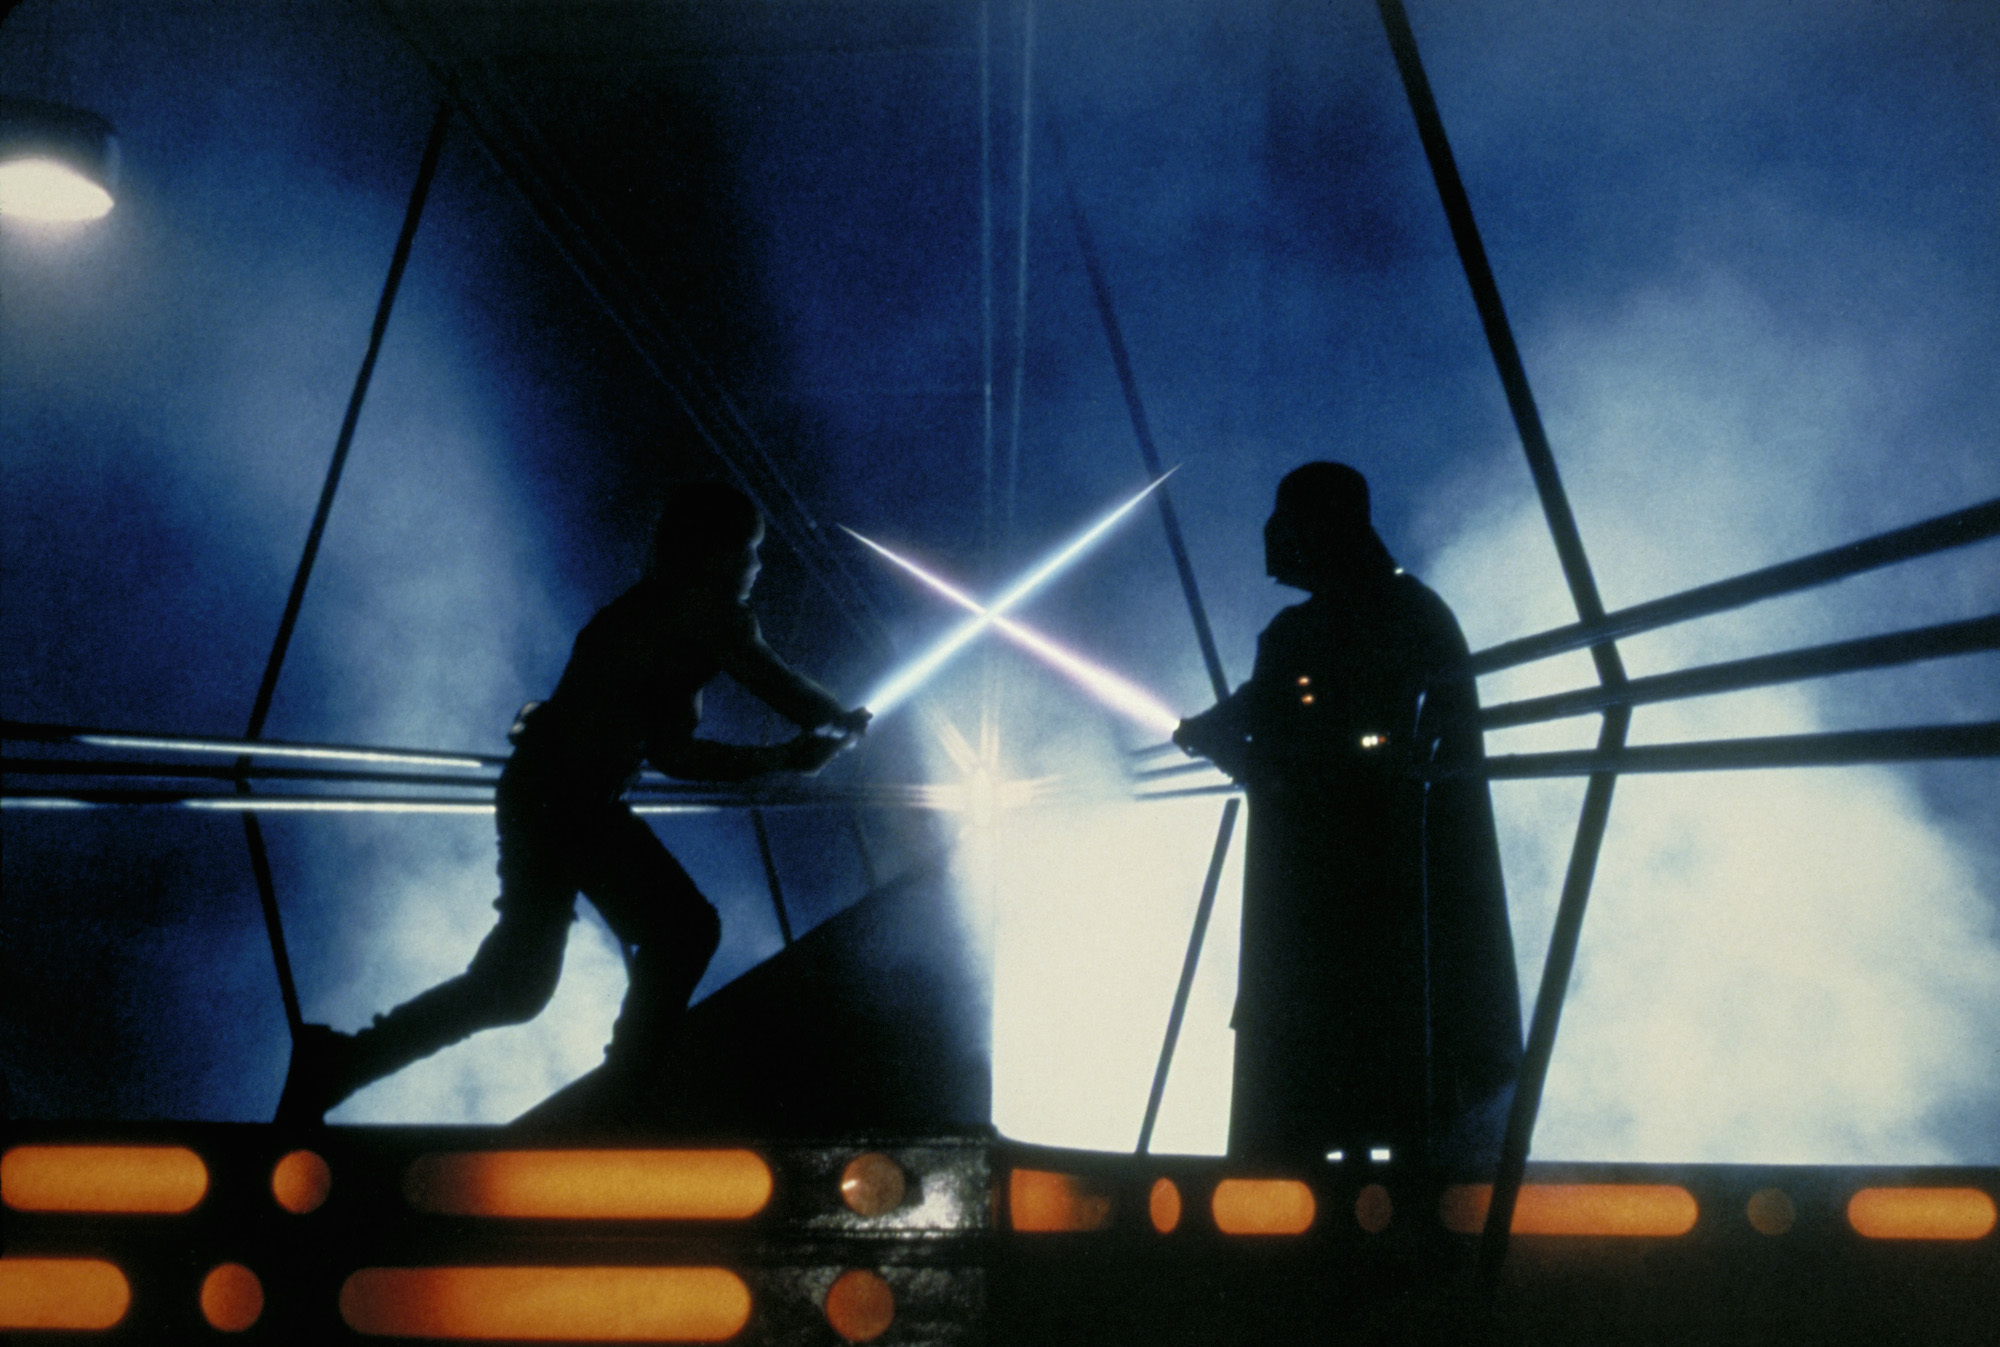 Come nasce una spada laser